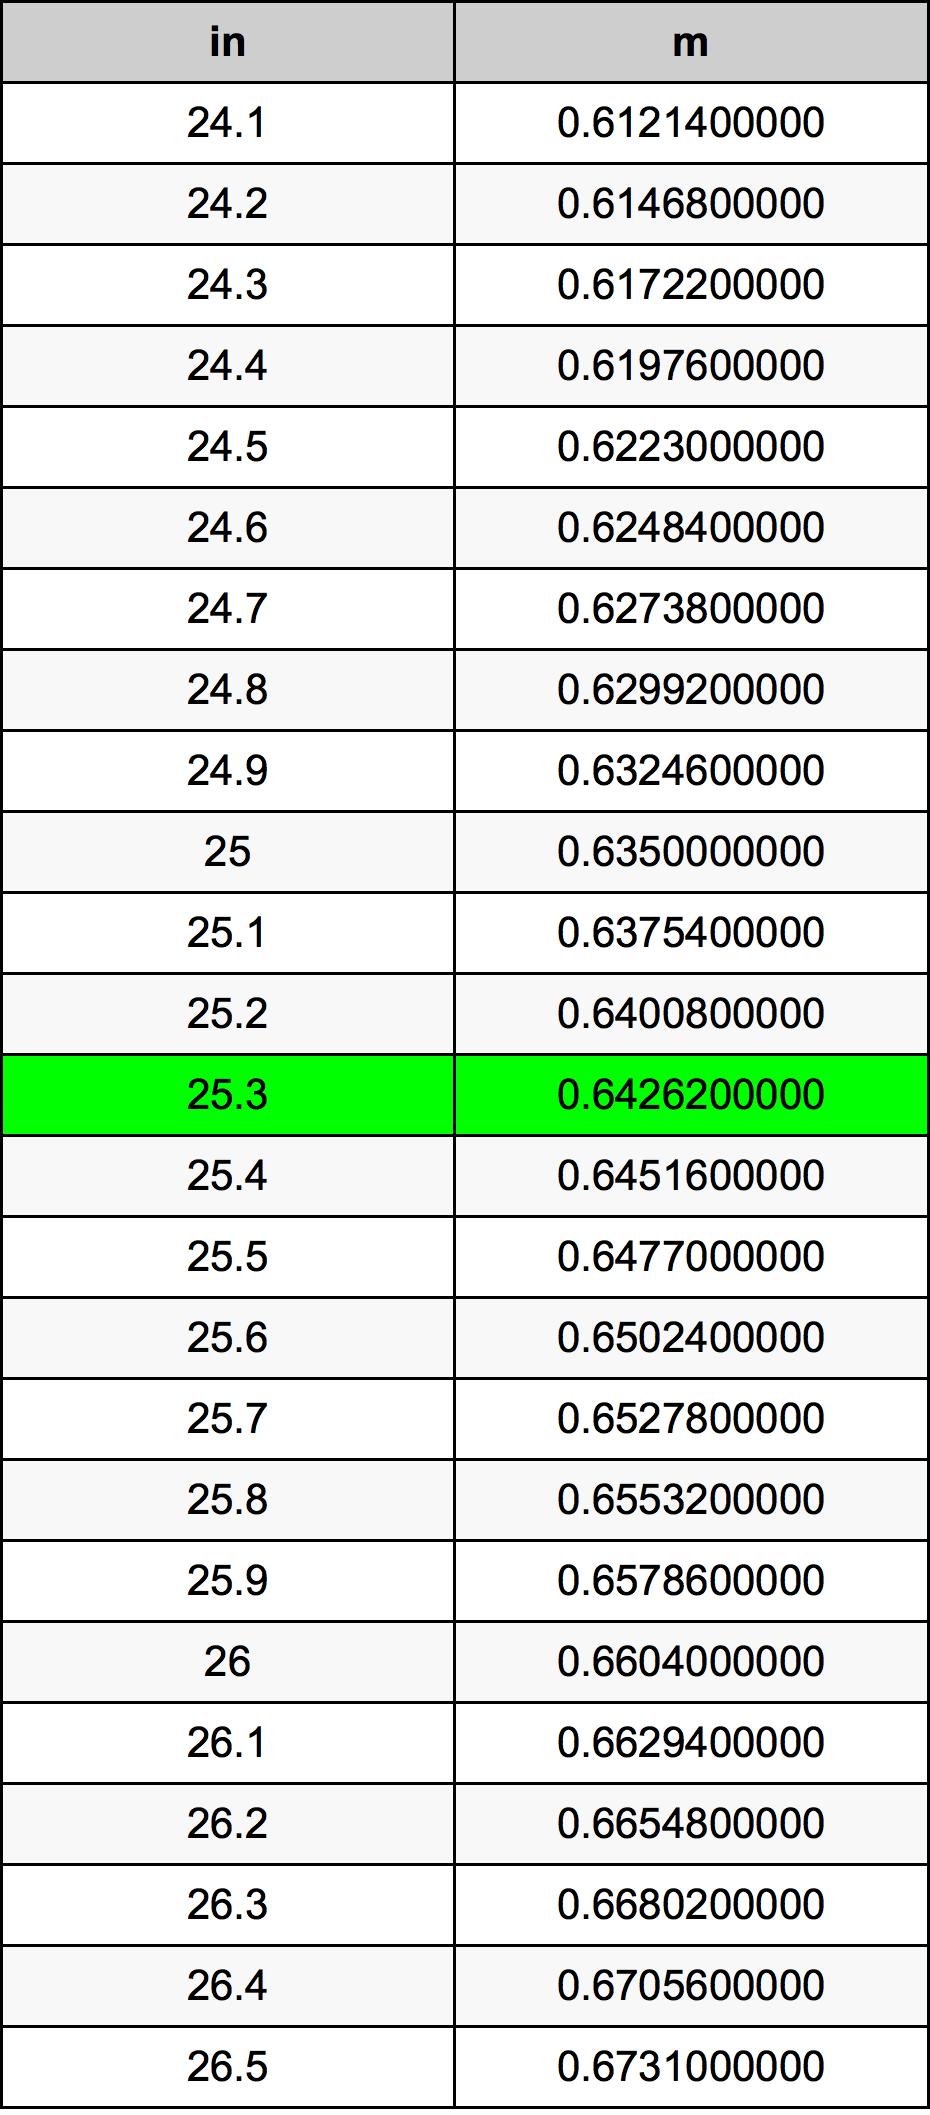 25.3 इंच रूपांतरण सारणी